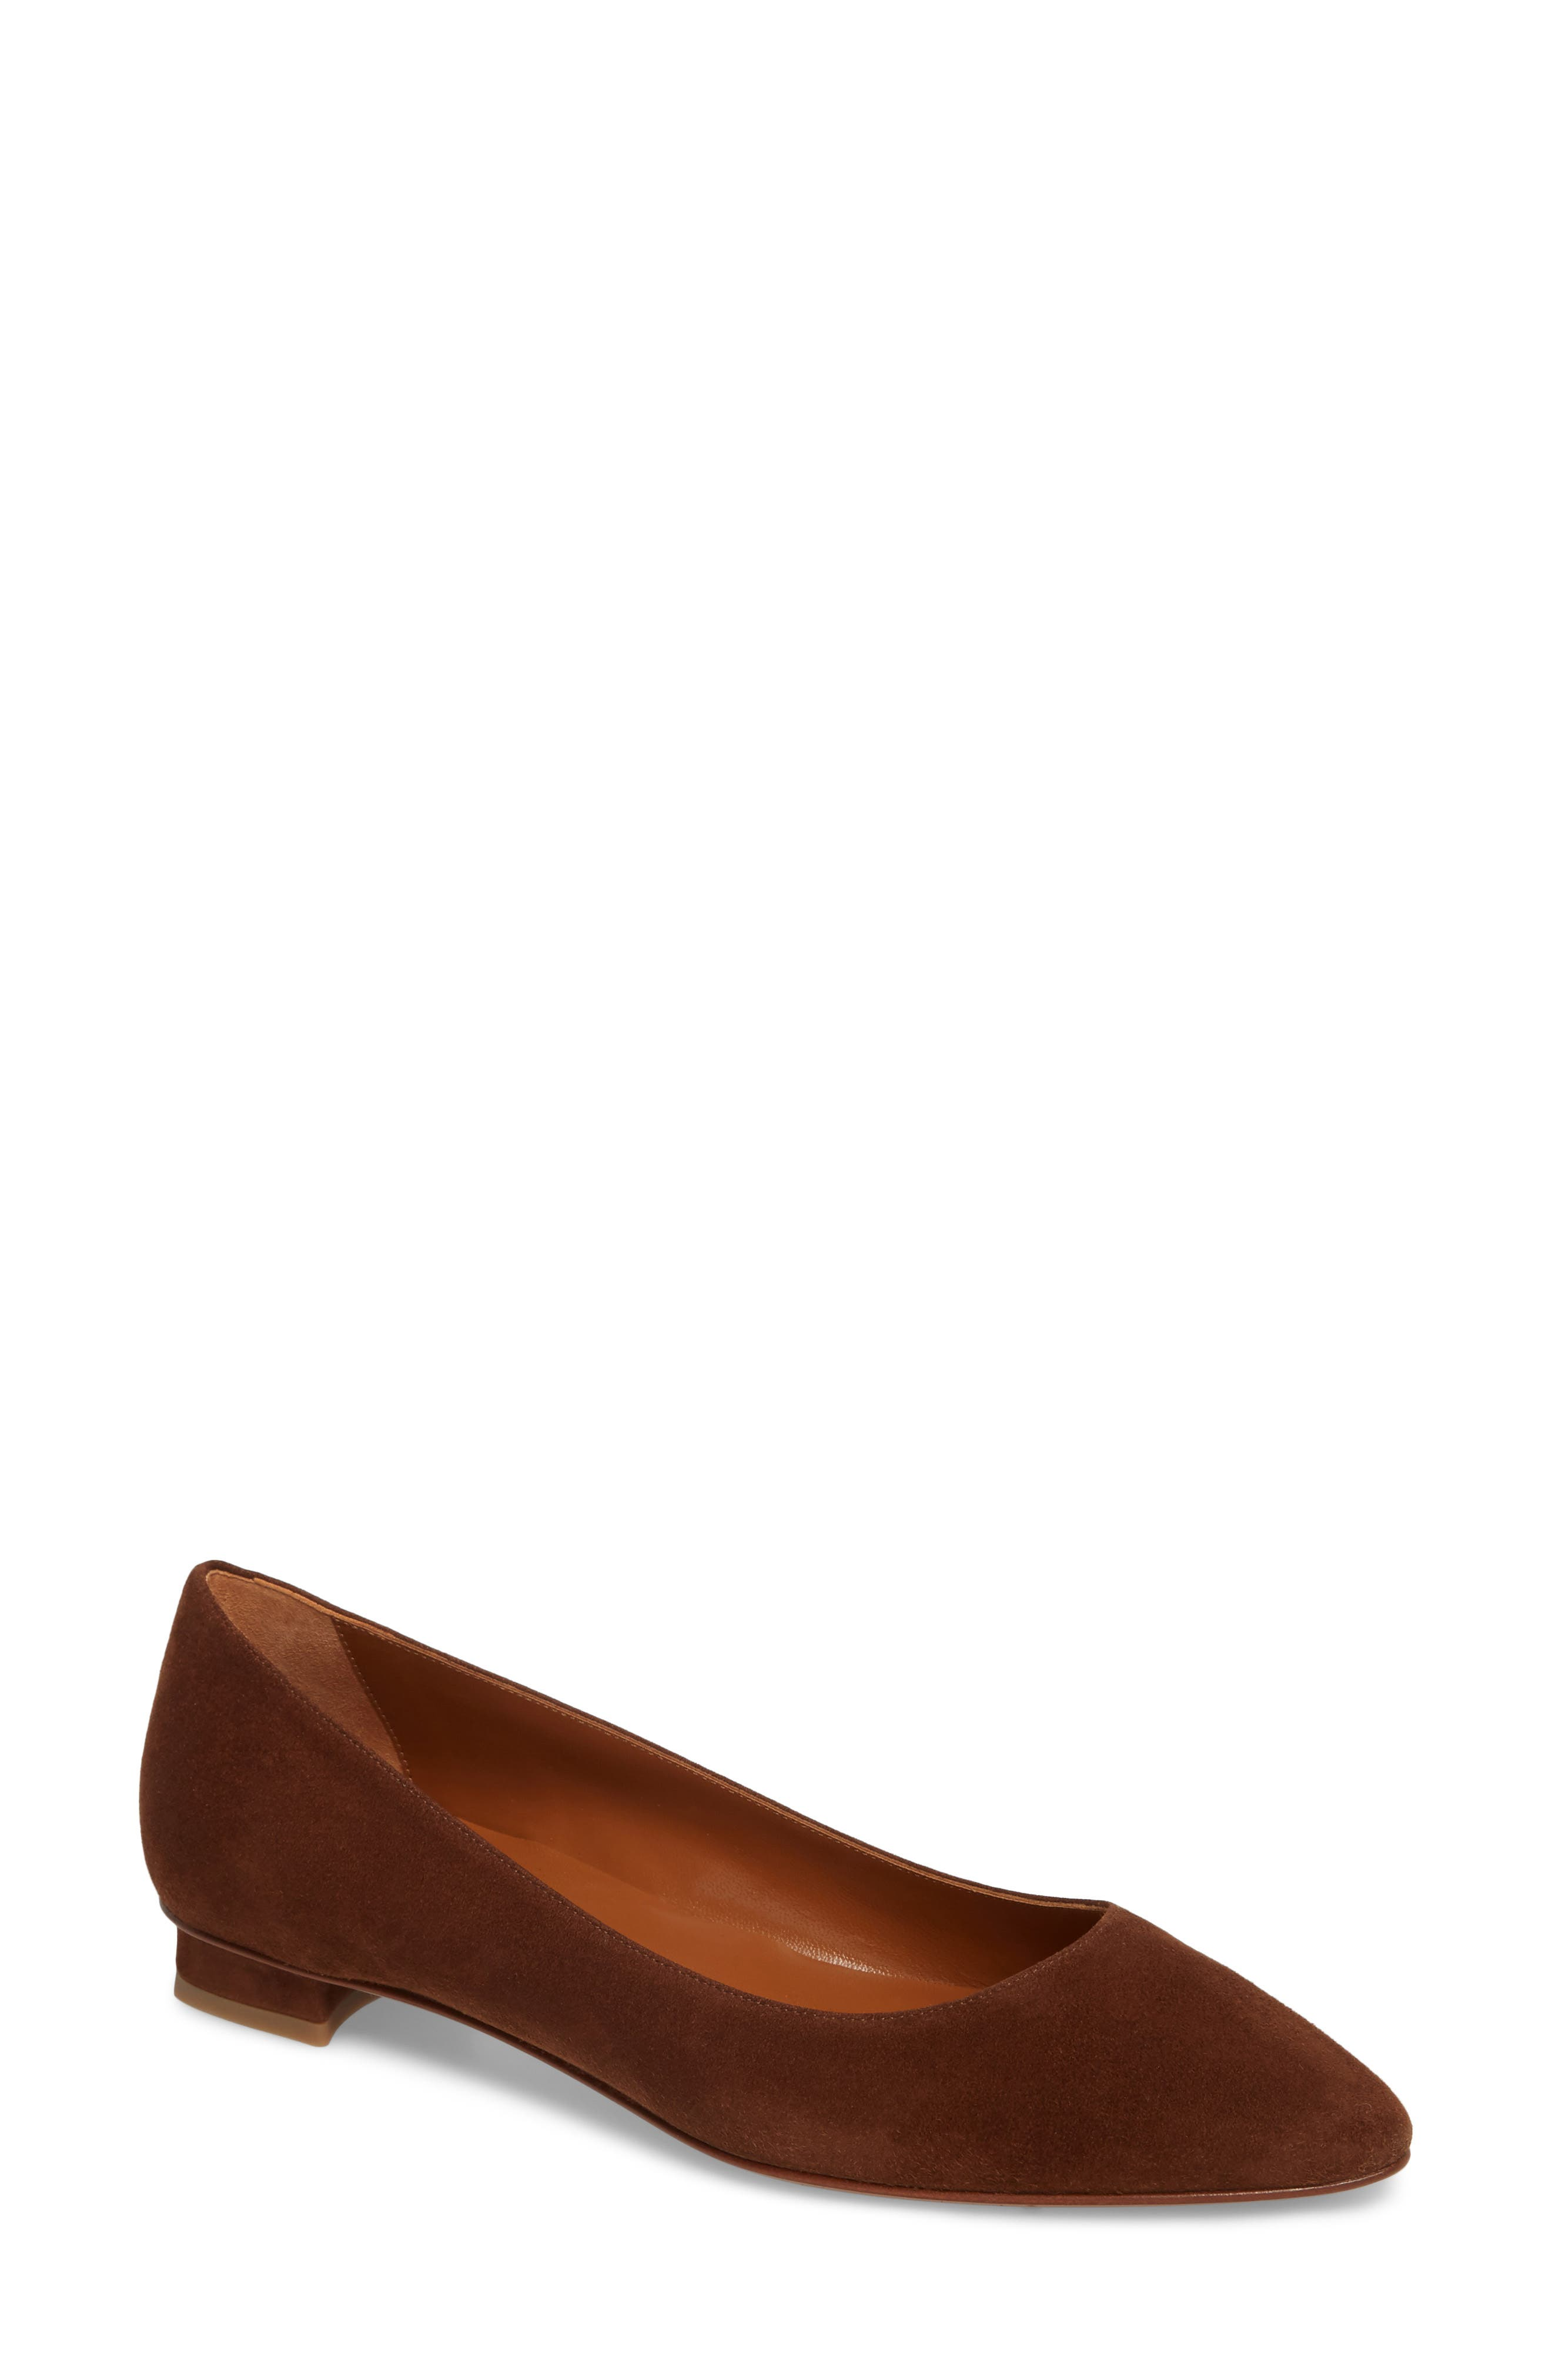 Alternate Image 1 Selected - Aquatalia Perla Weatherproof Ballerina Shoe (Women)